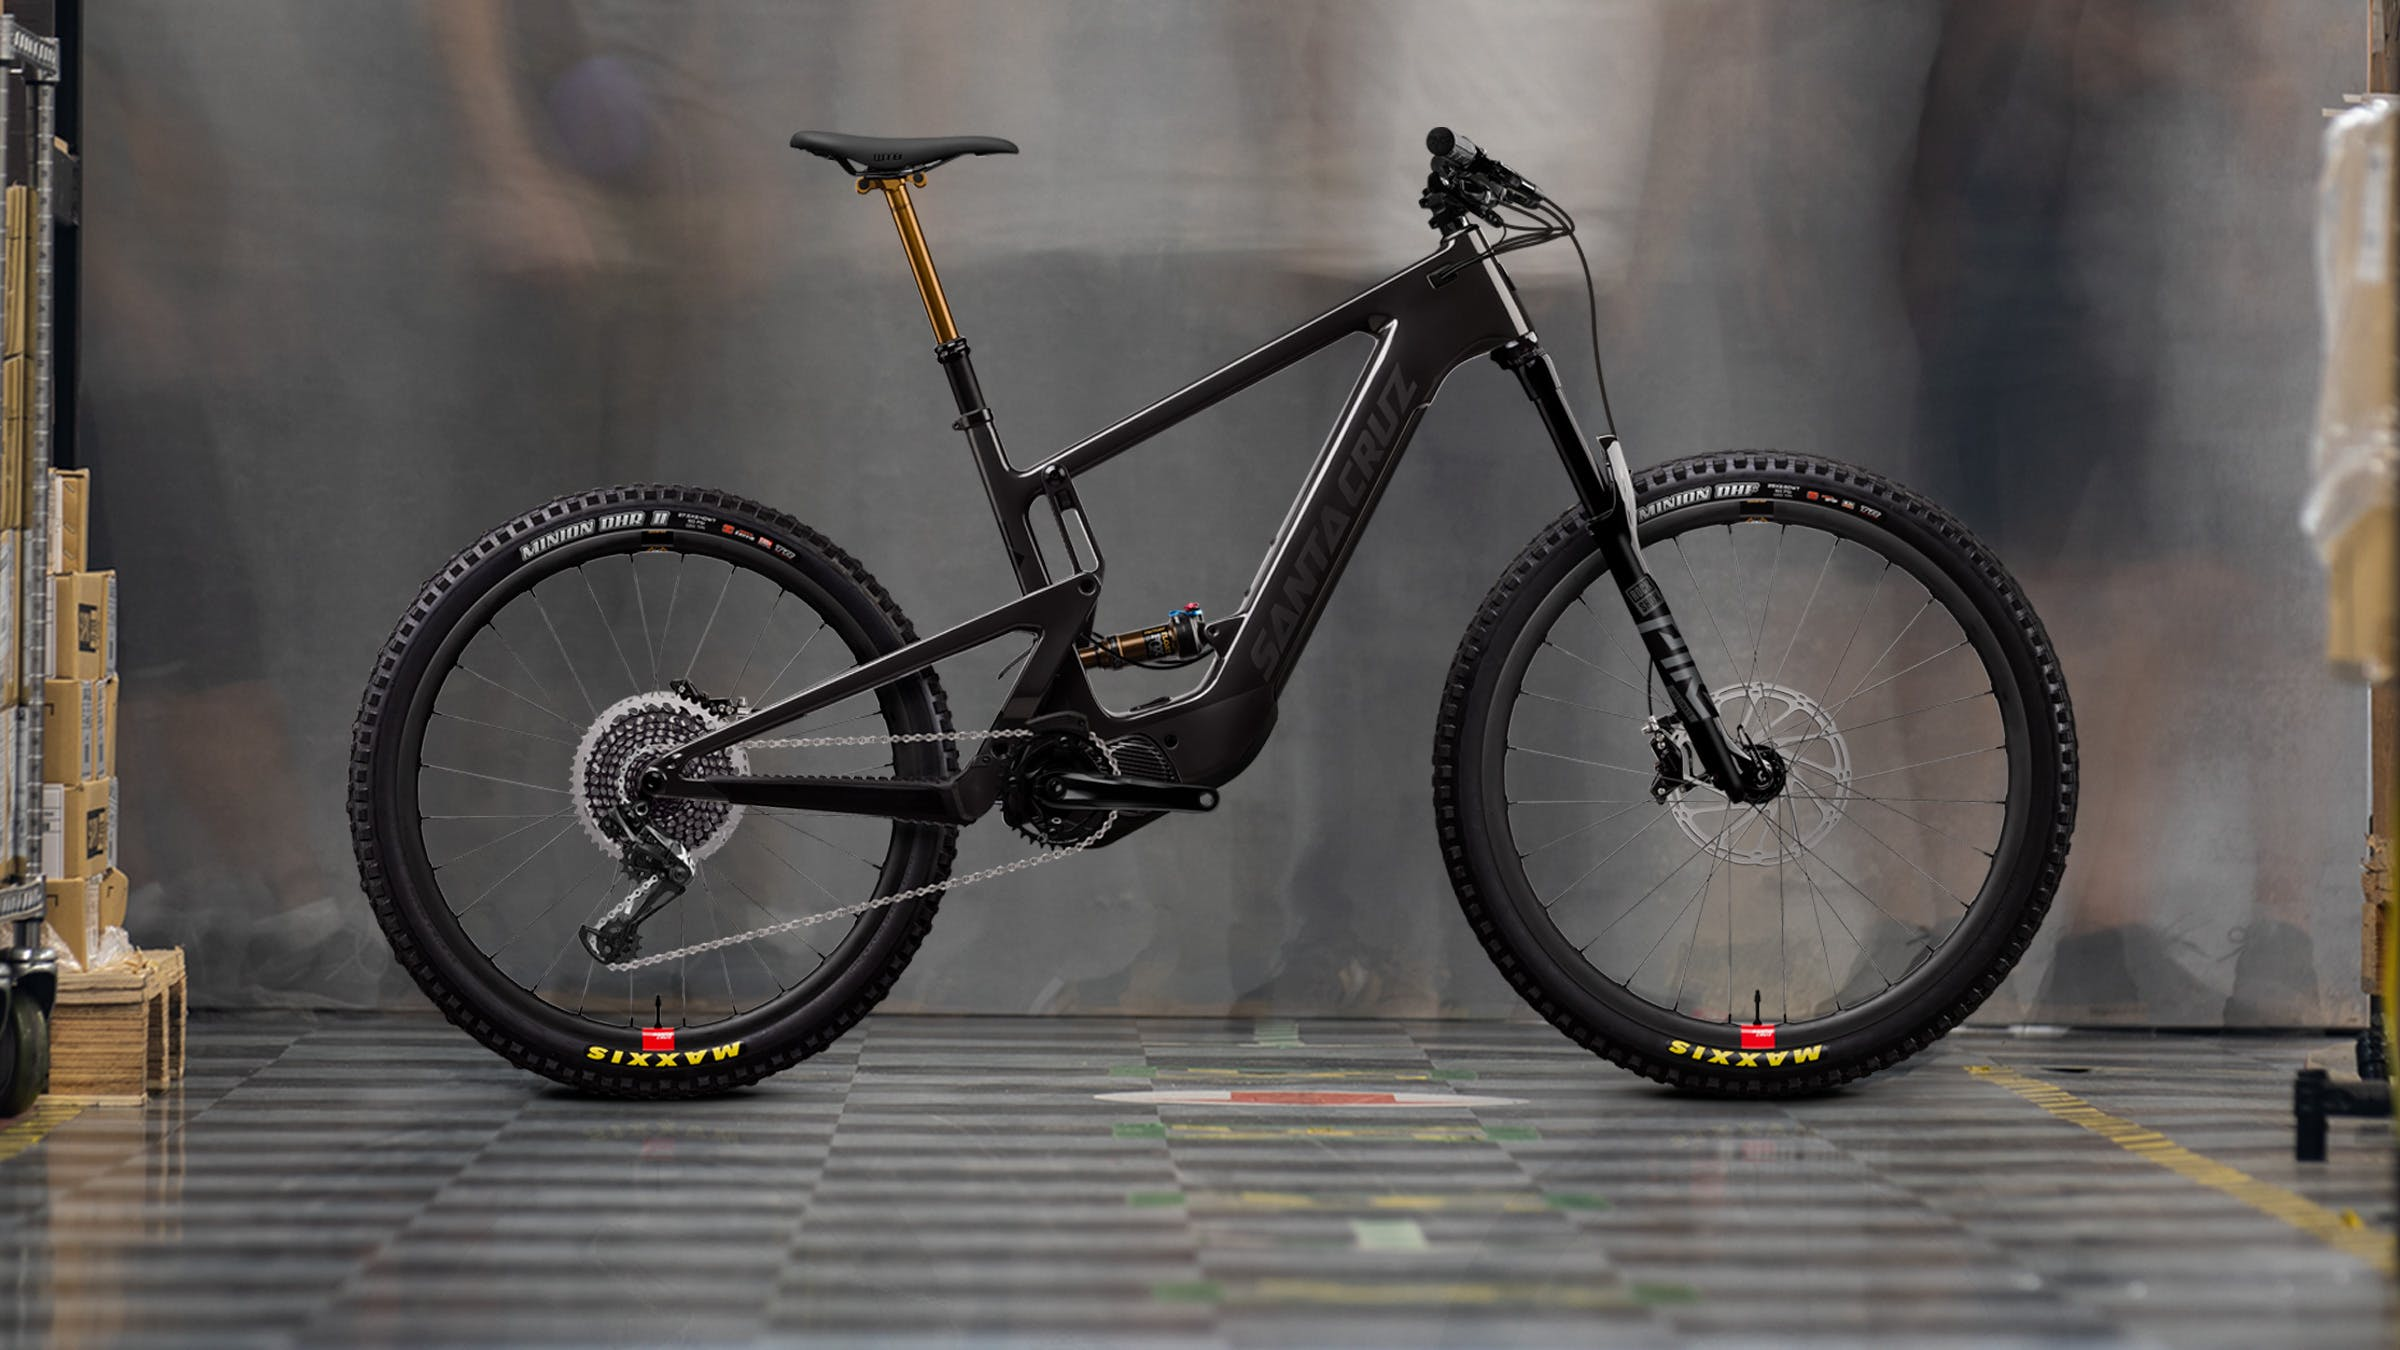 2022 Heckler MX X01 RSV in Black